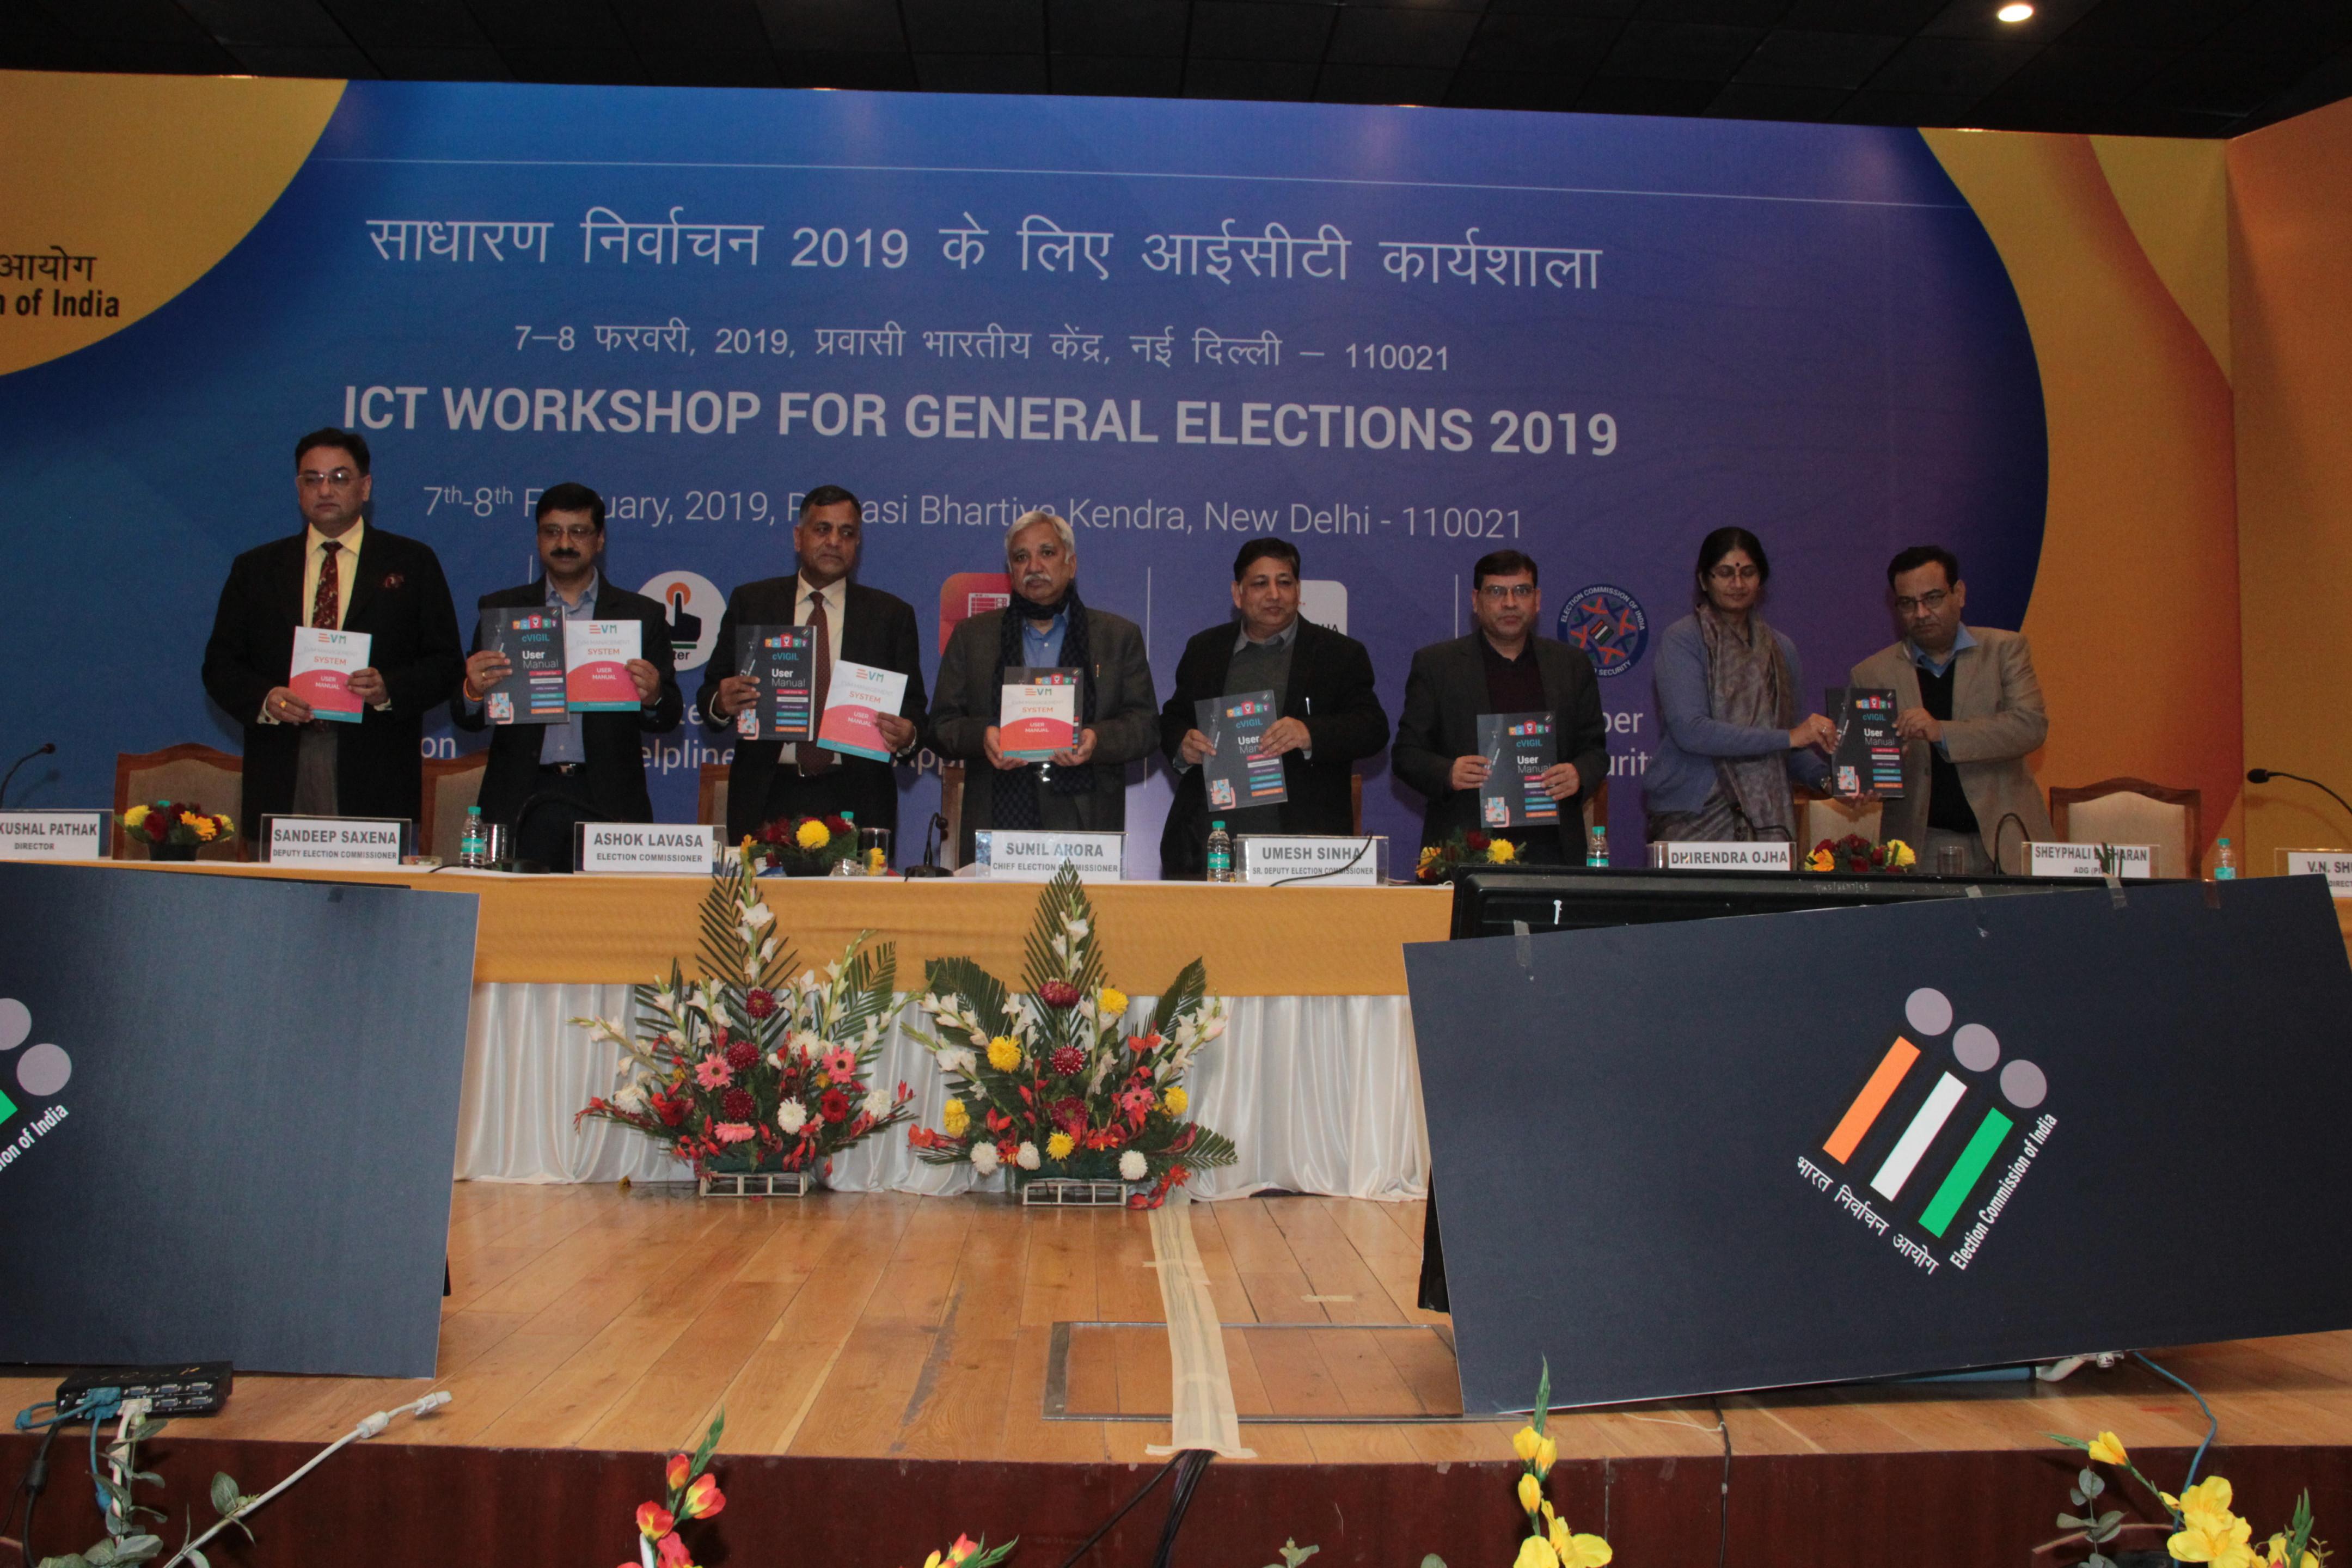 ICT workshop for General Elections 2019